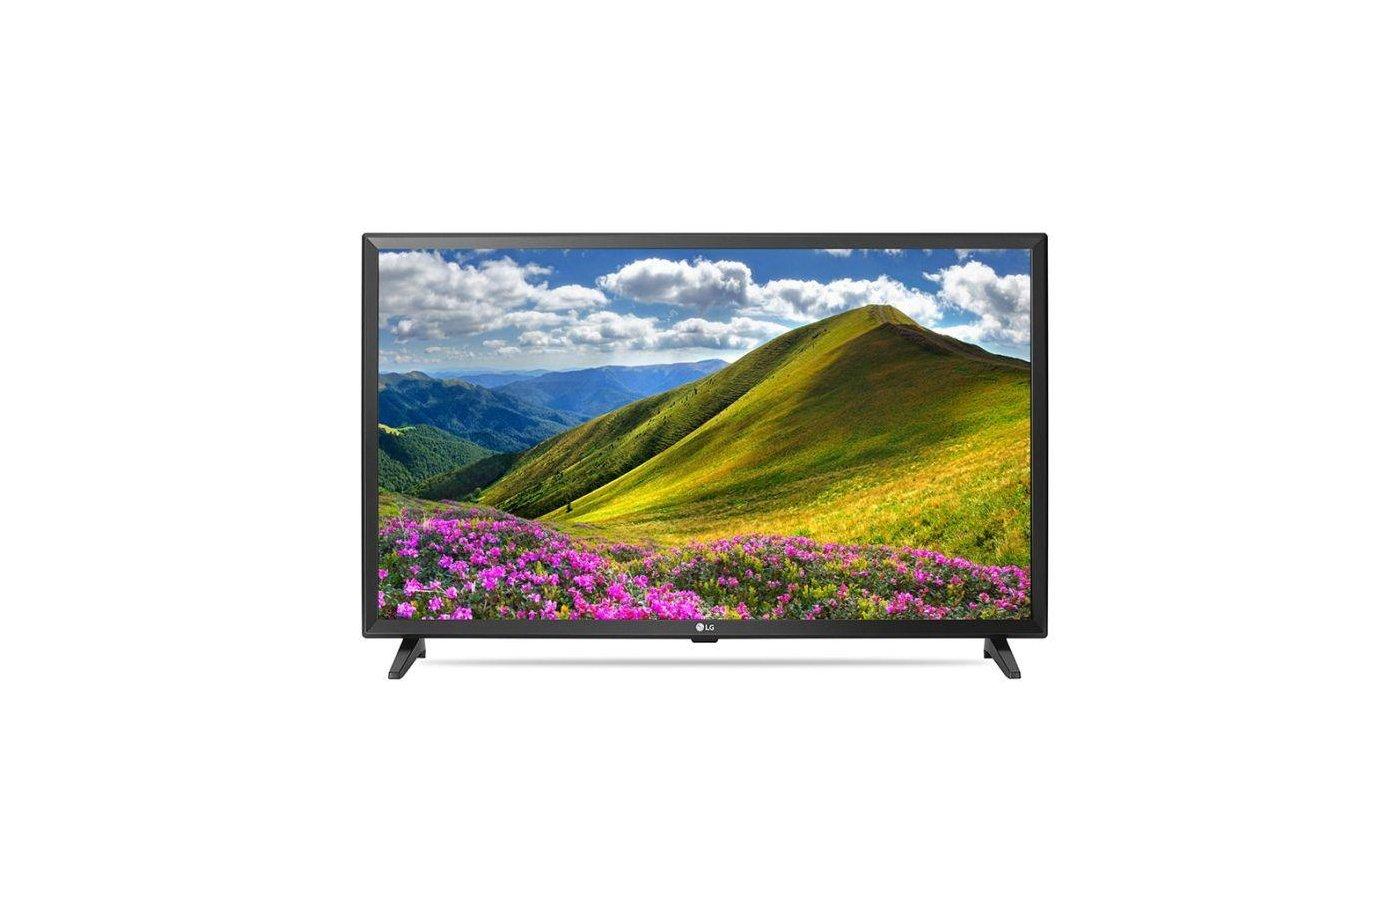 купить телевизор цена москва